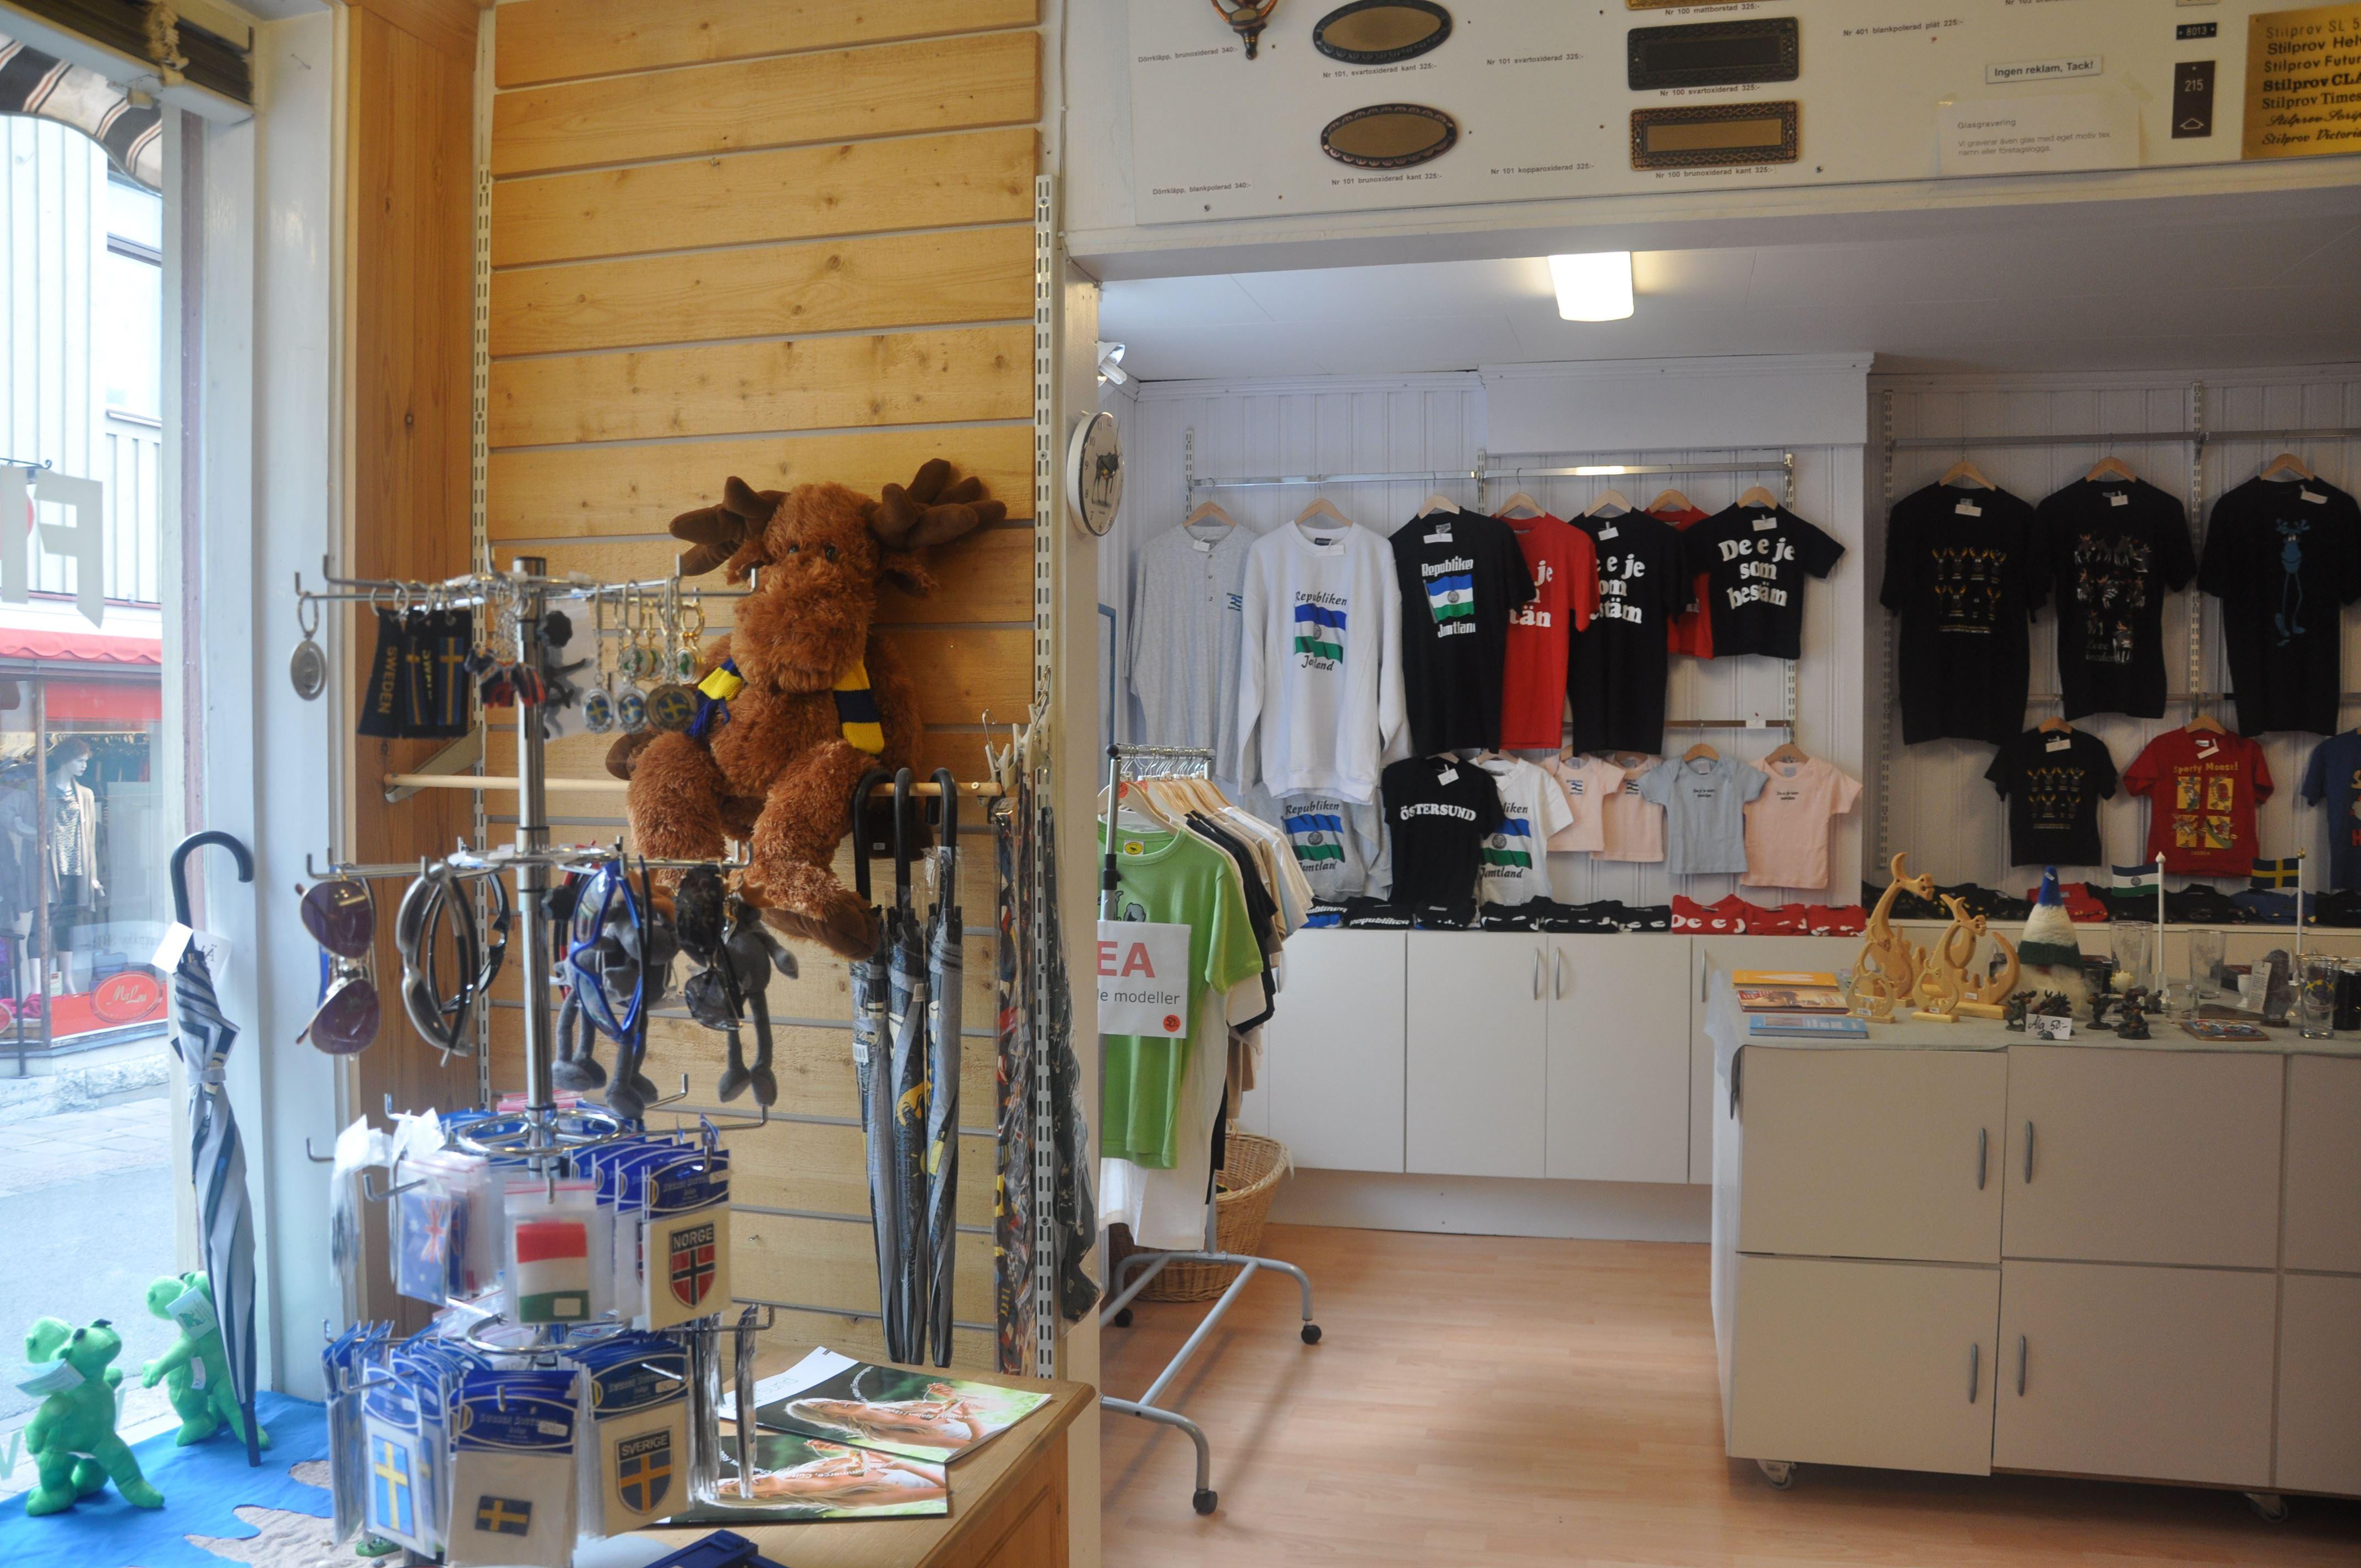 Foto: Flaggbutiken,  © Copy: Visit Östersund, Souvenirprodukter